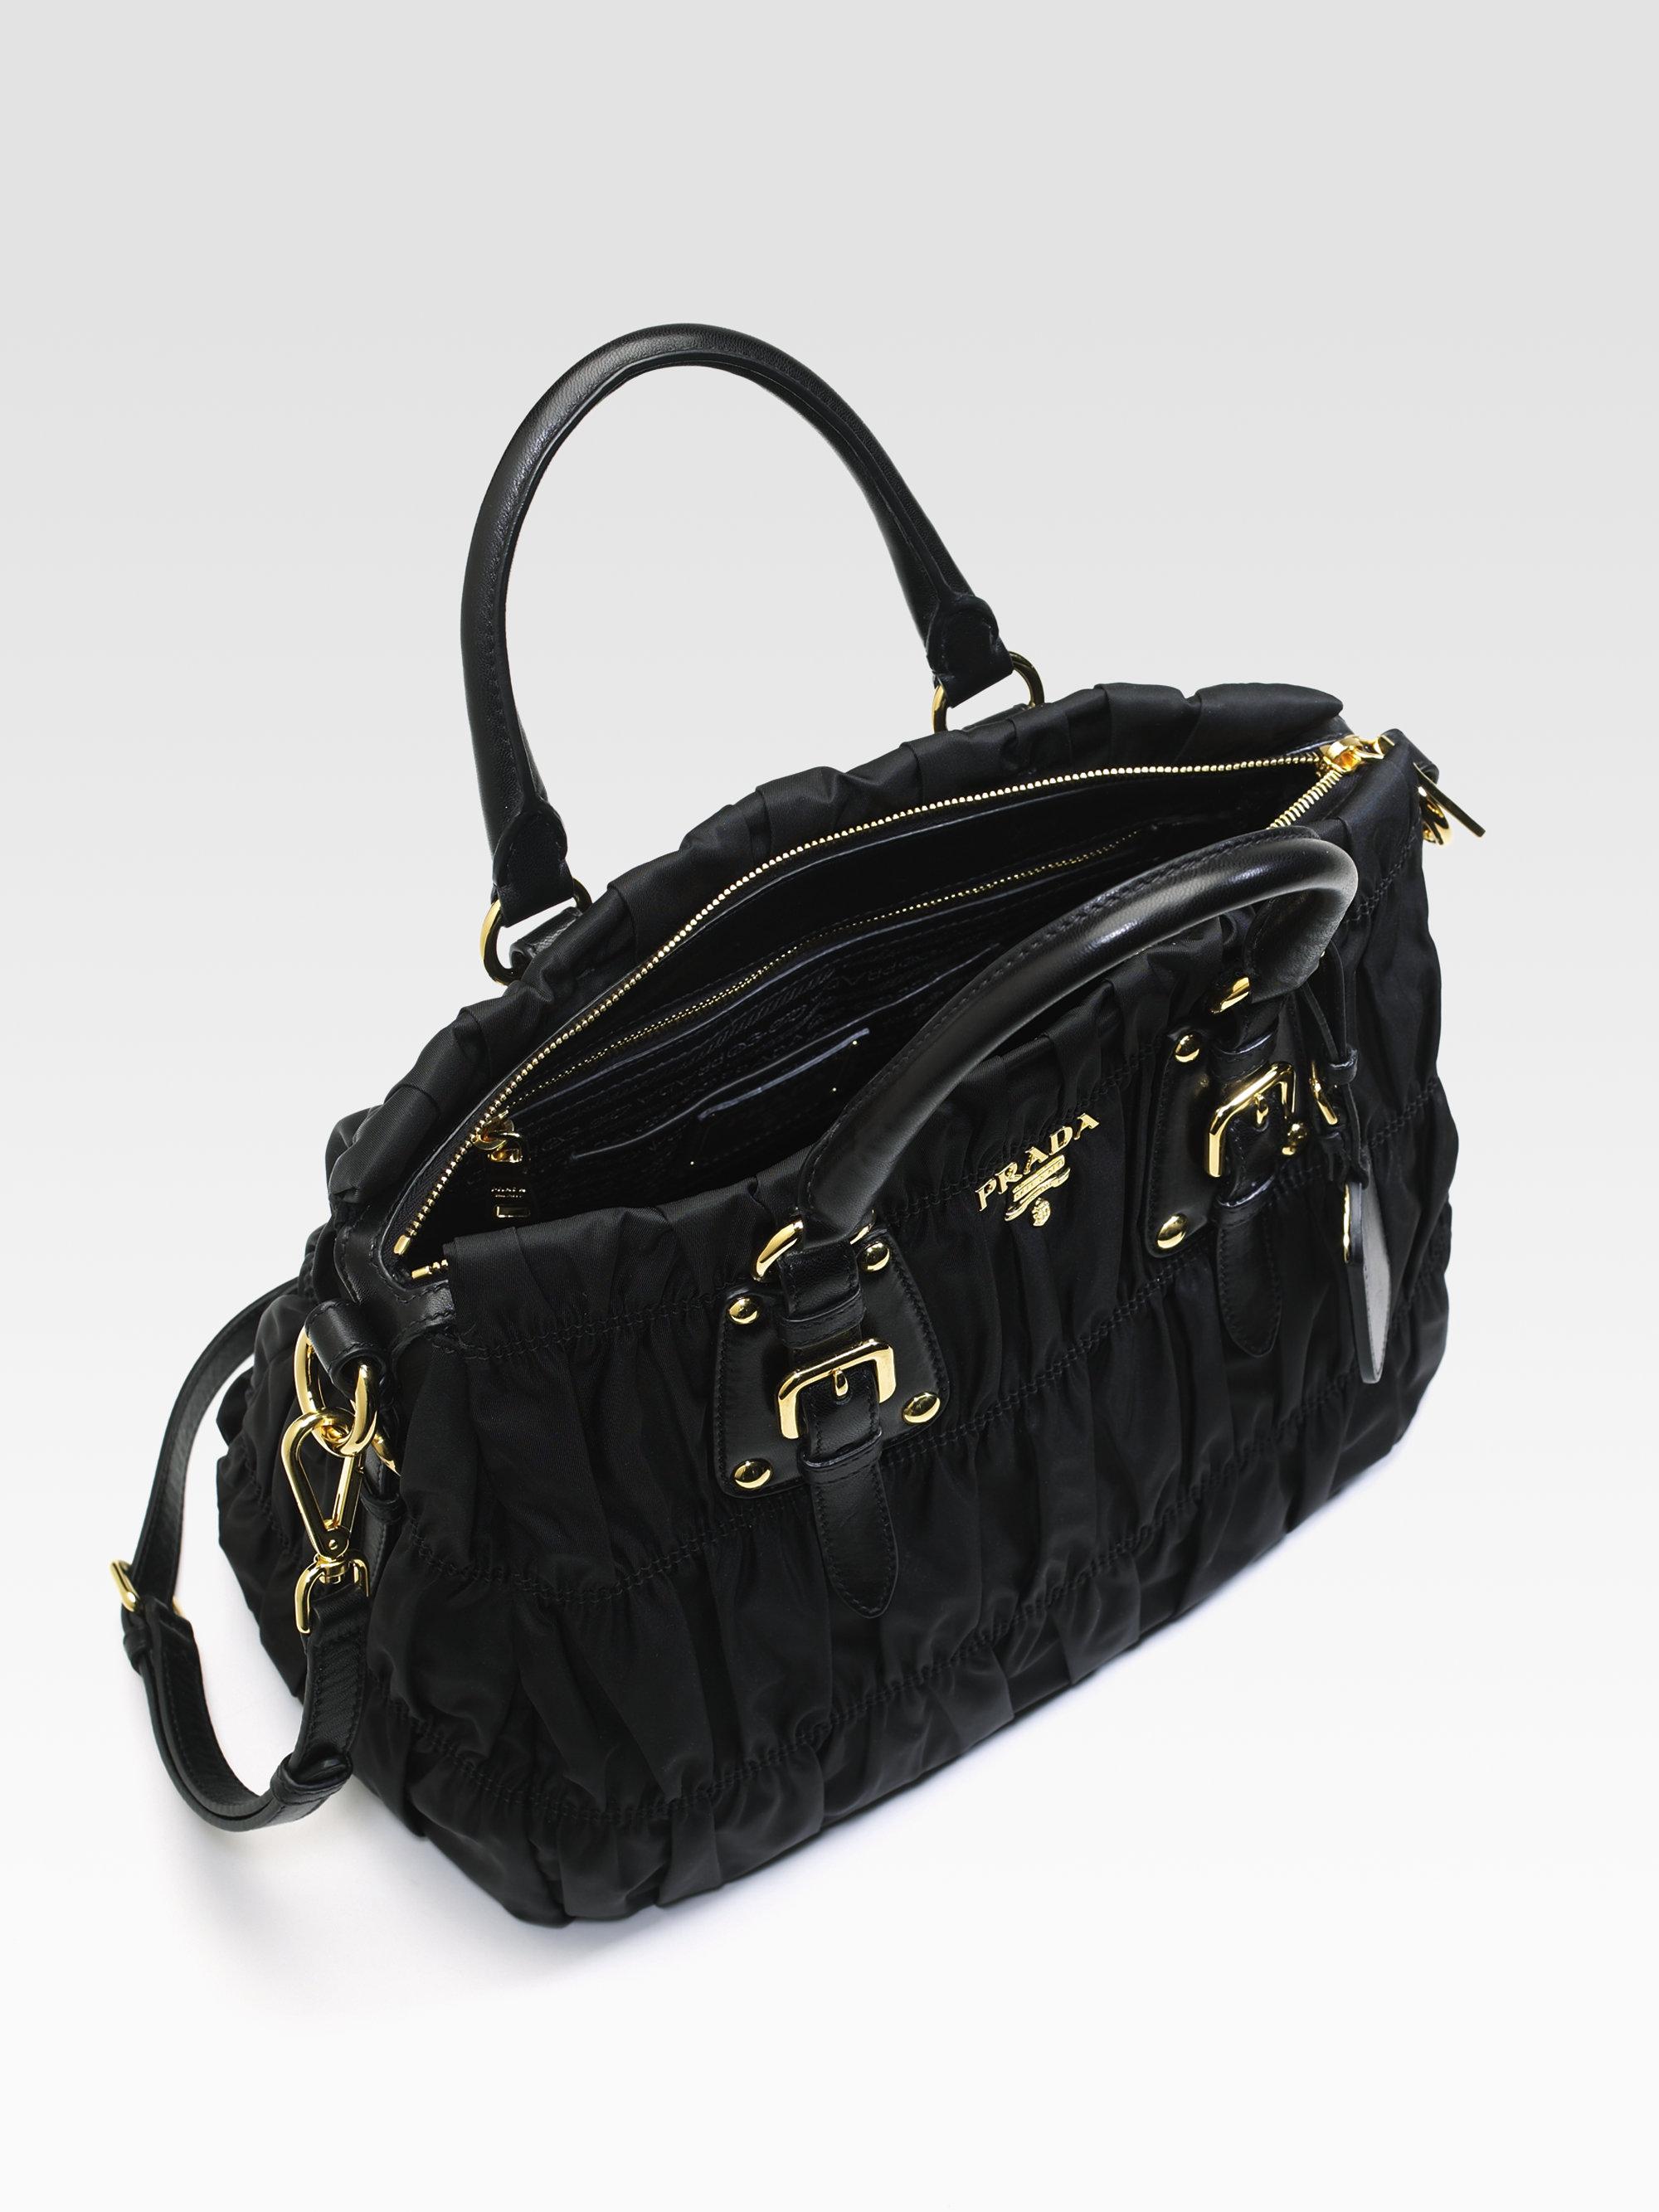 8bb55bbacc3f ... good lyst prada tessuto gaufre tote bag in black 44531 2dfa4